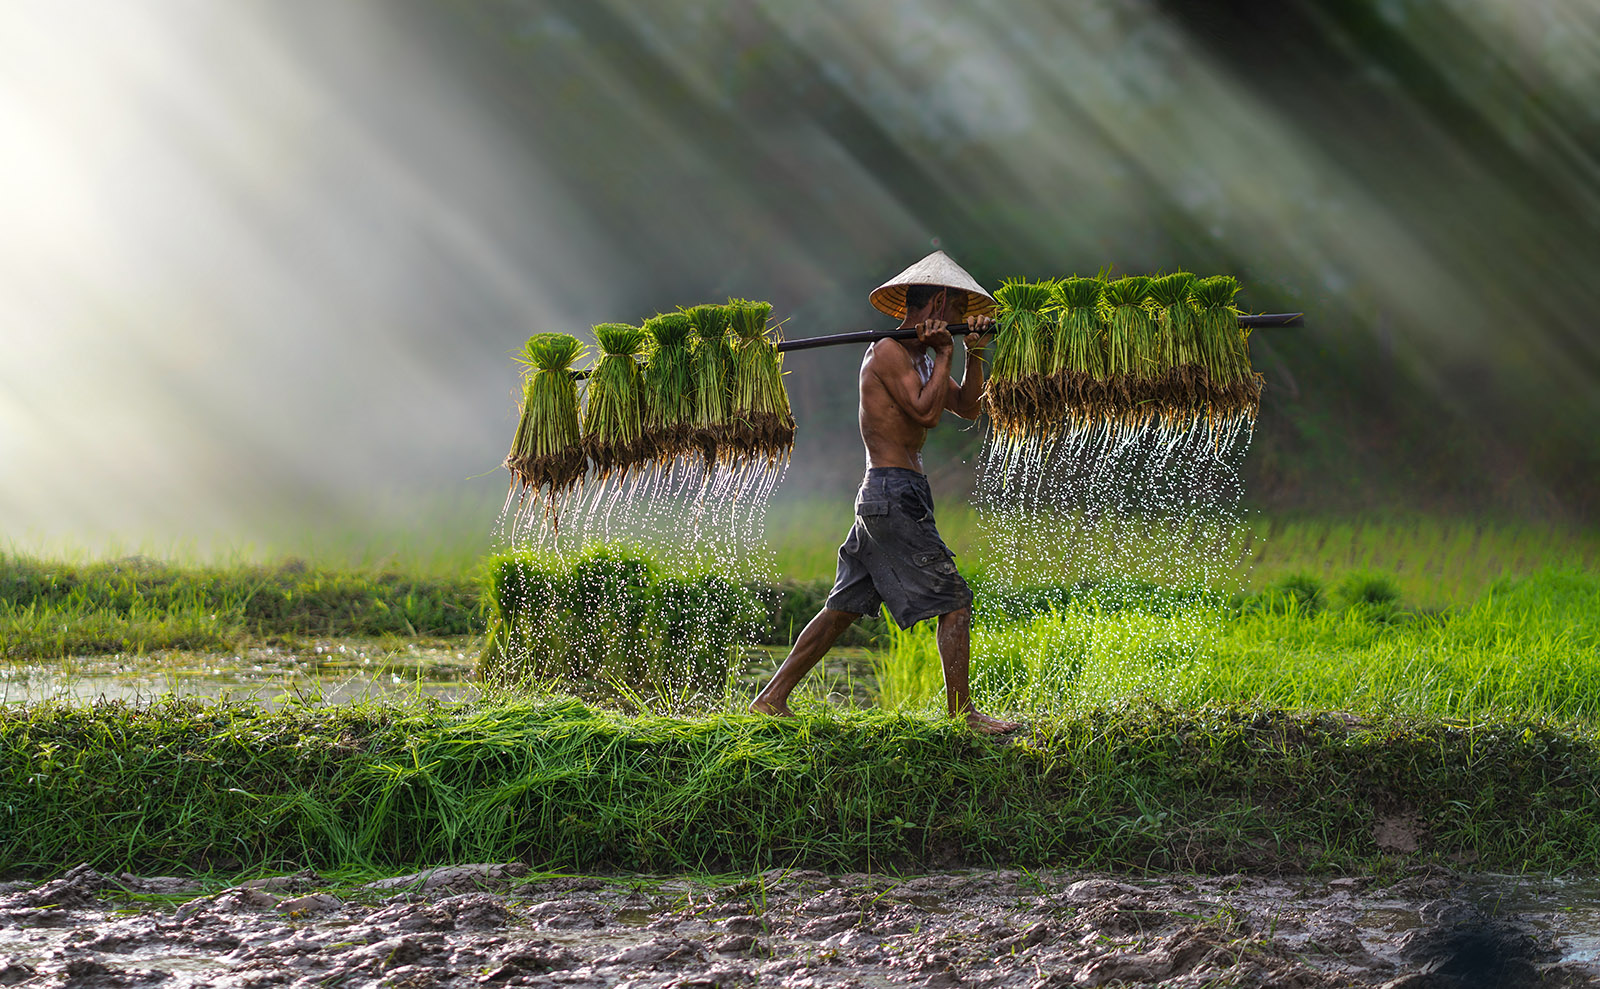 farmer carrying rice seedlings in a paddy field